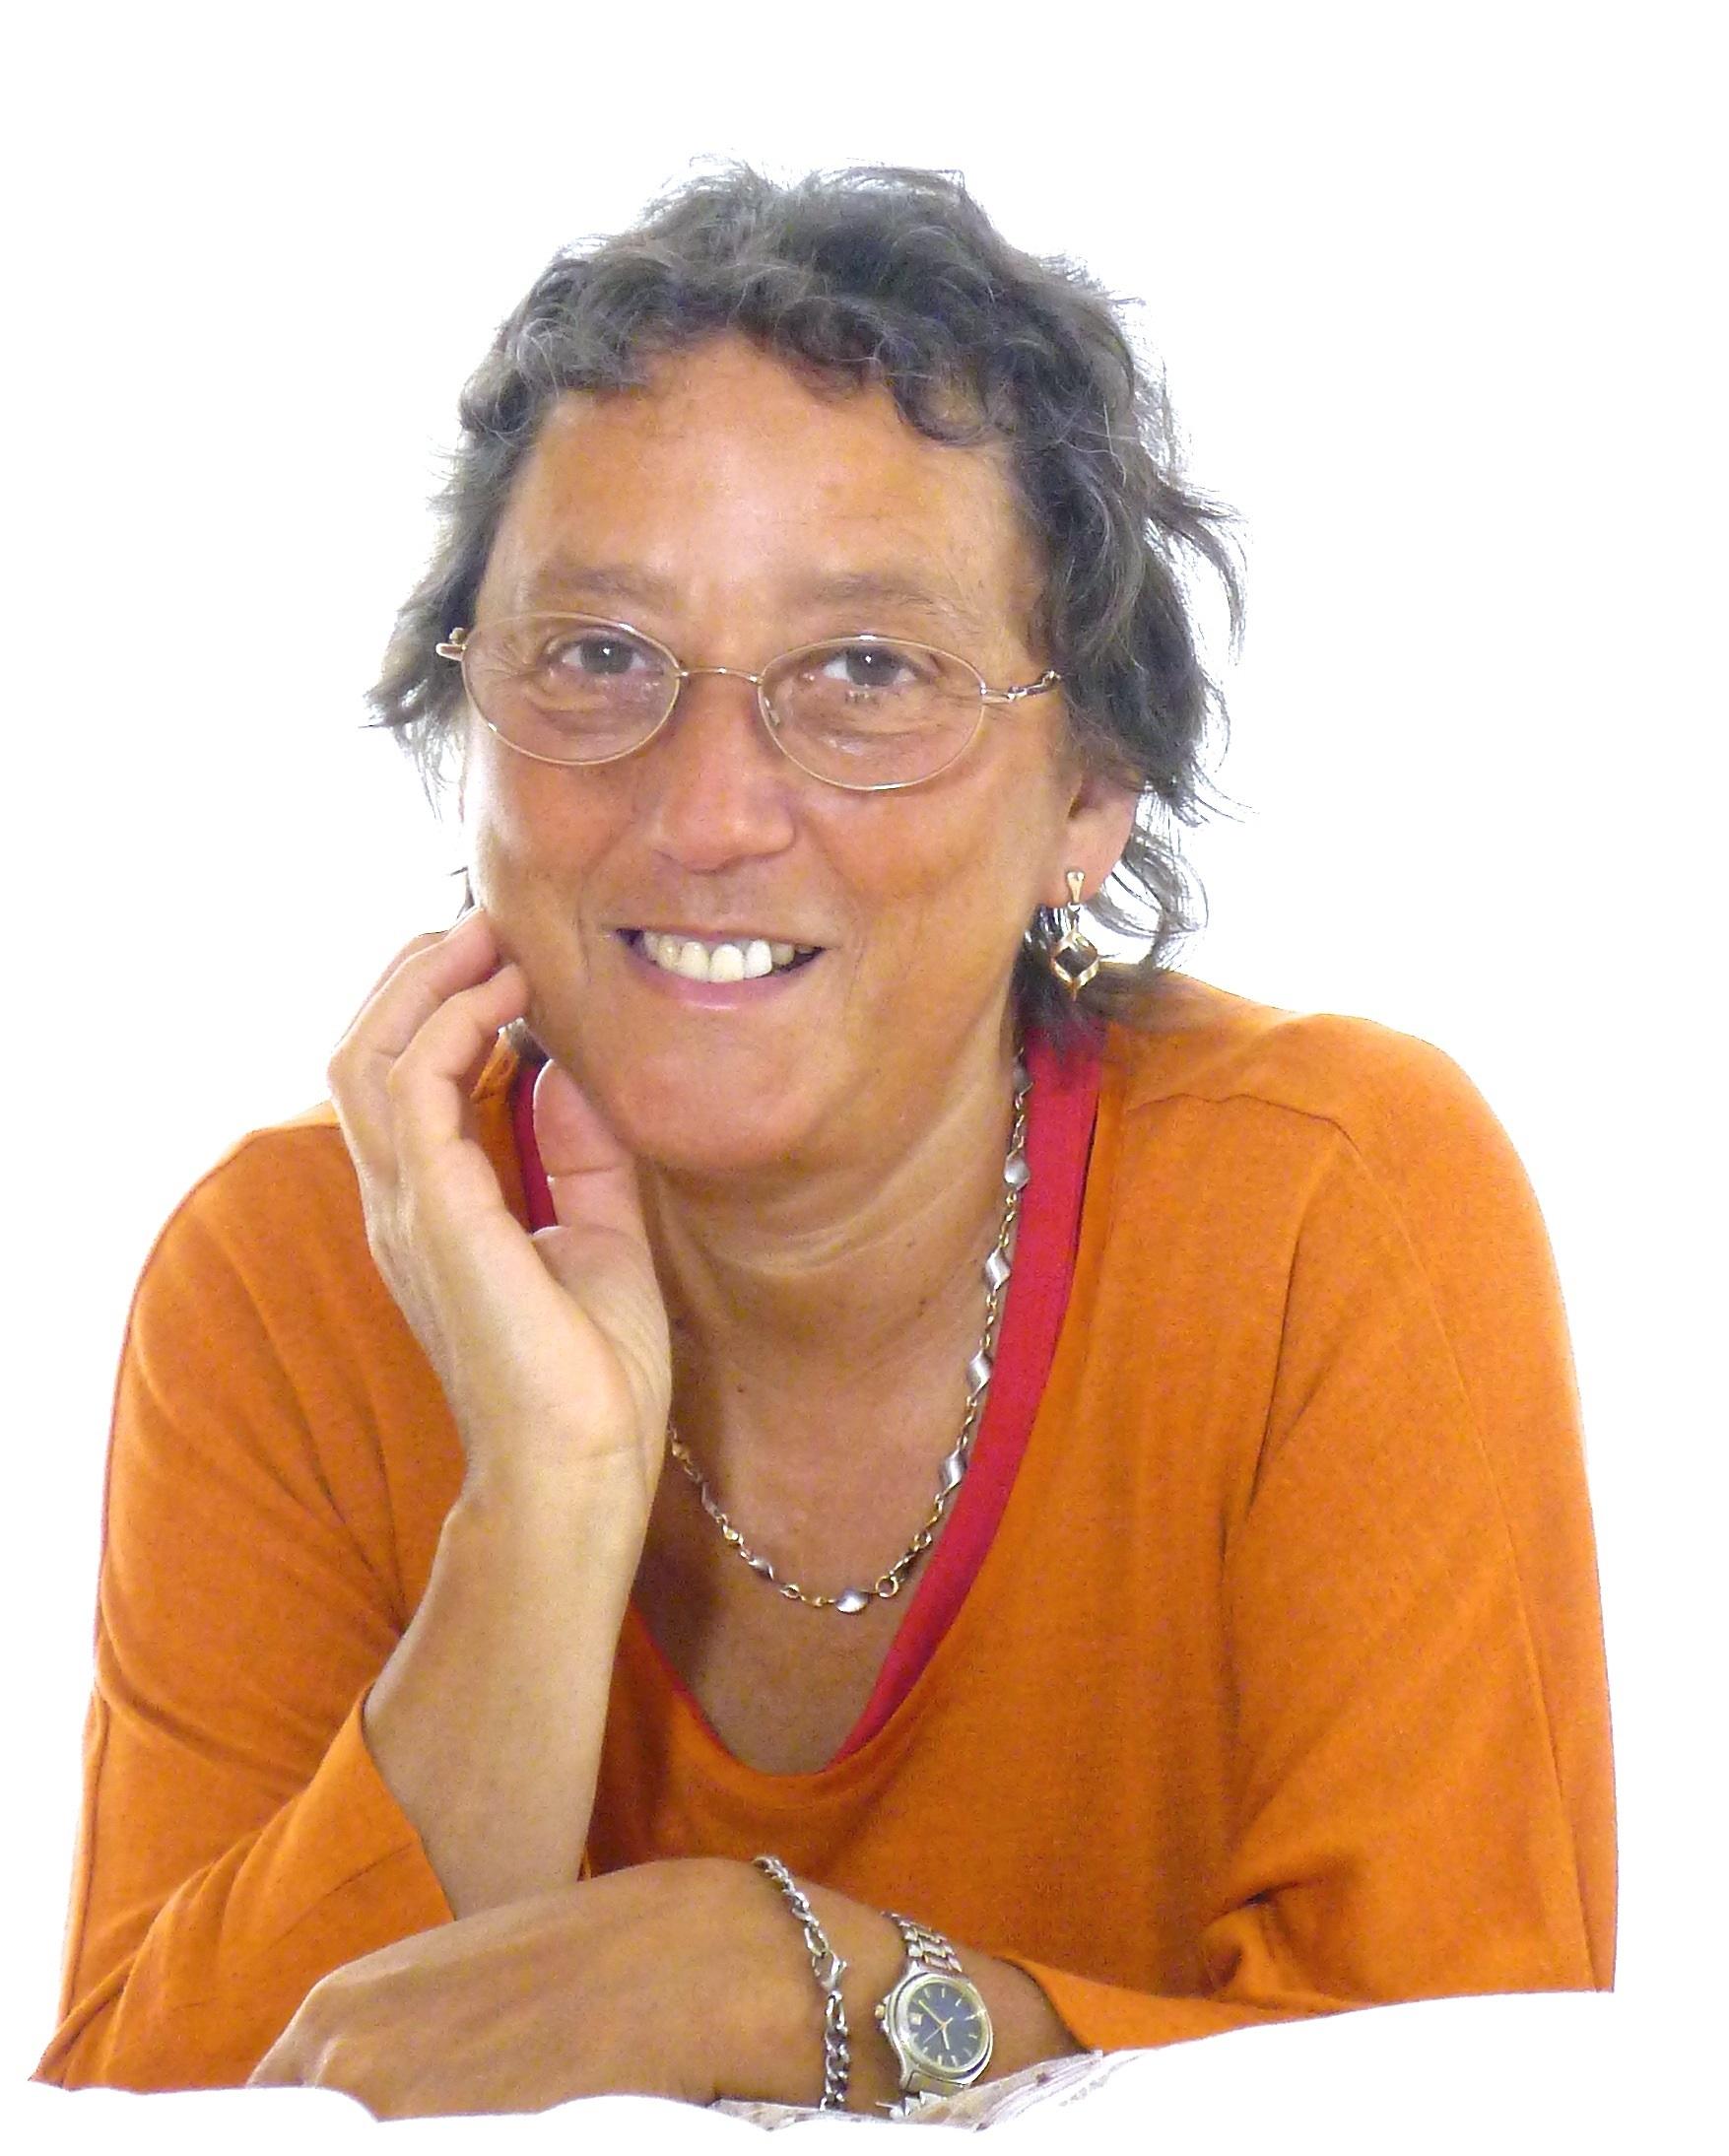 Morwenna Hansmann